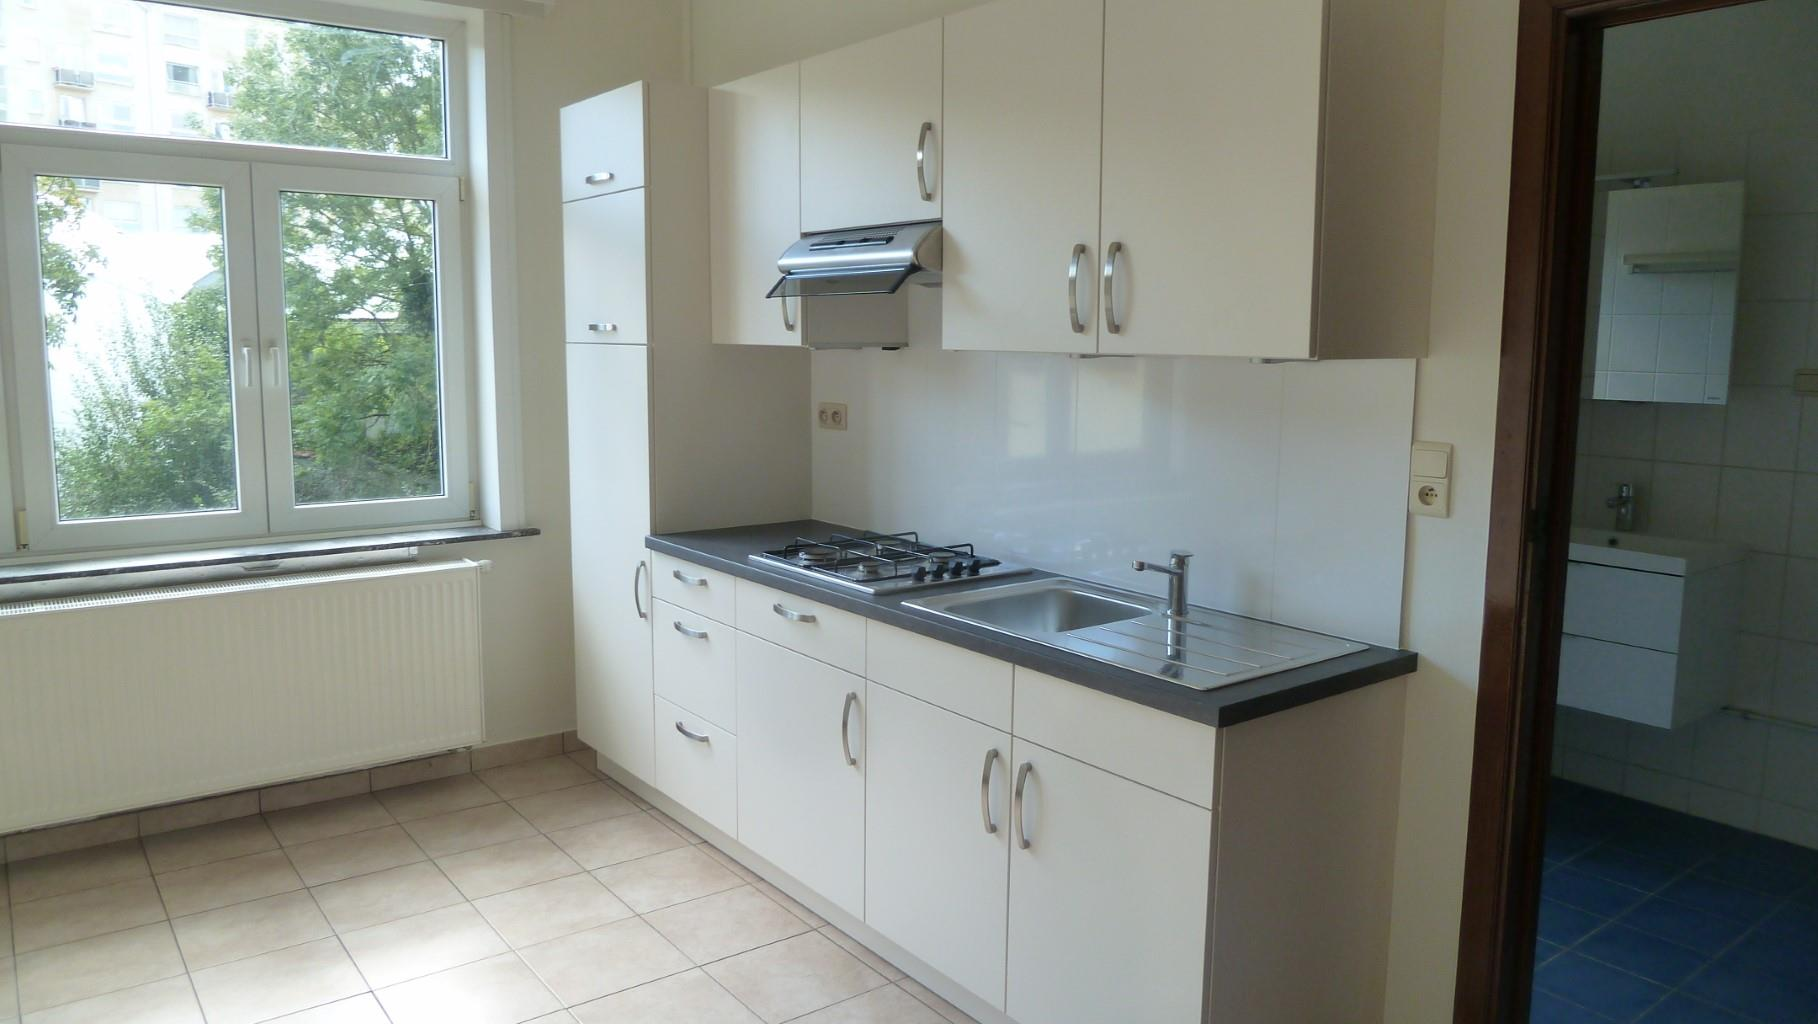 Flat - Sint-Lambrechts-Woluwe - #3185938-0